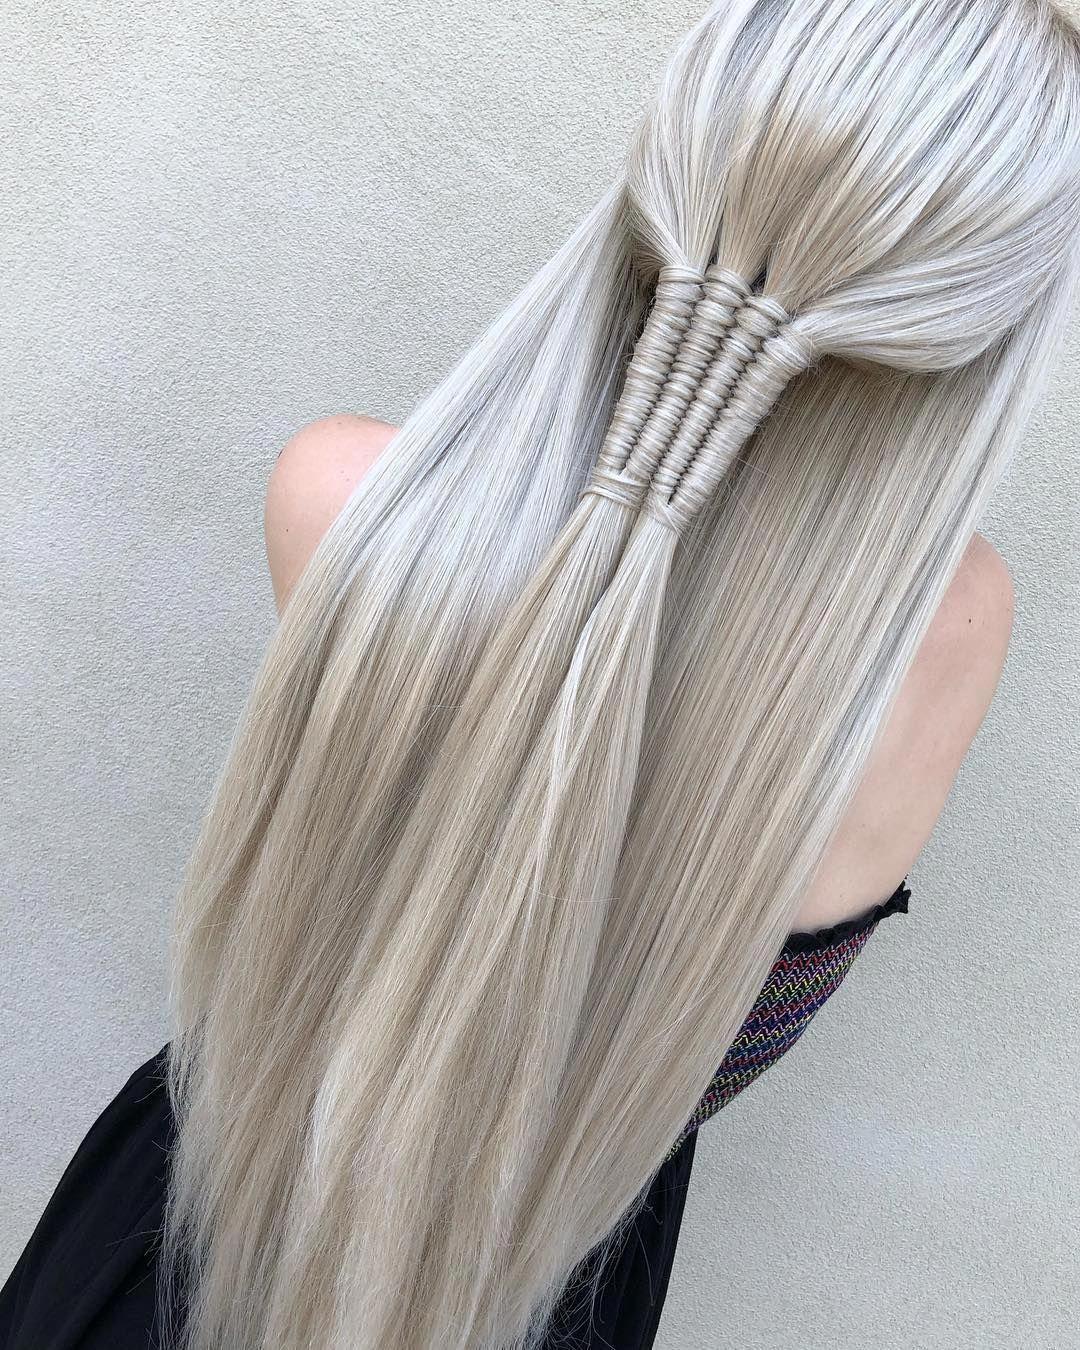 Loading... Braidedhair - Hair Beauty